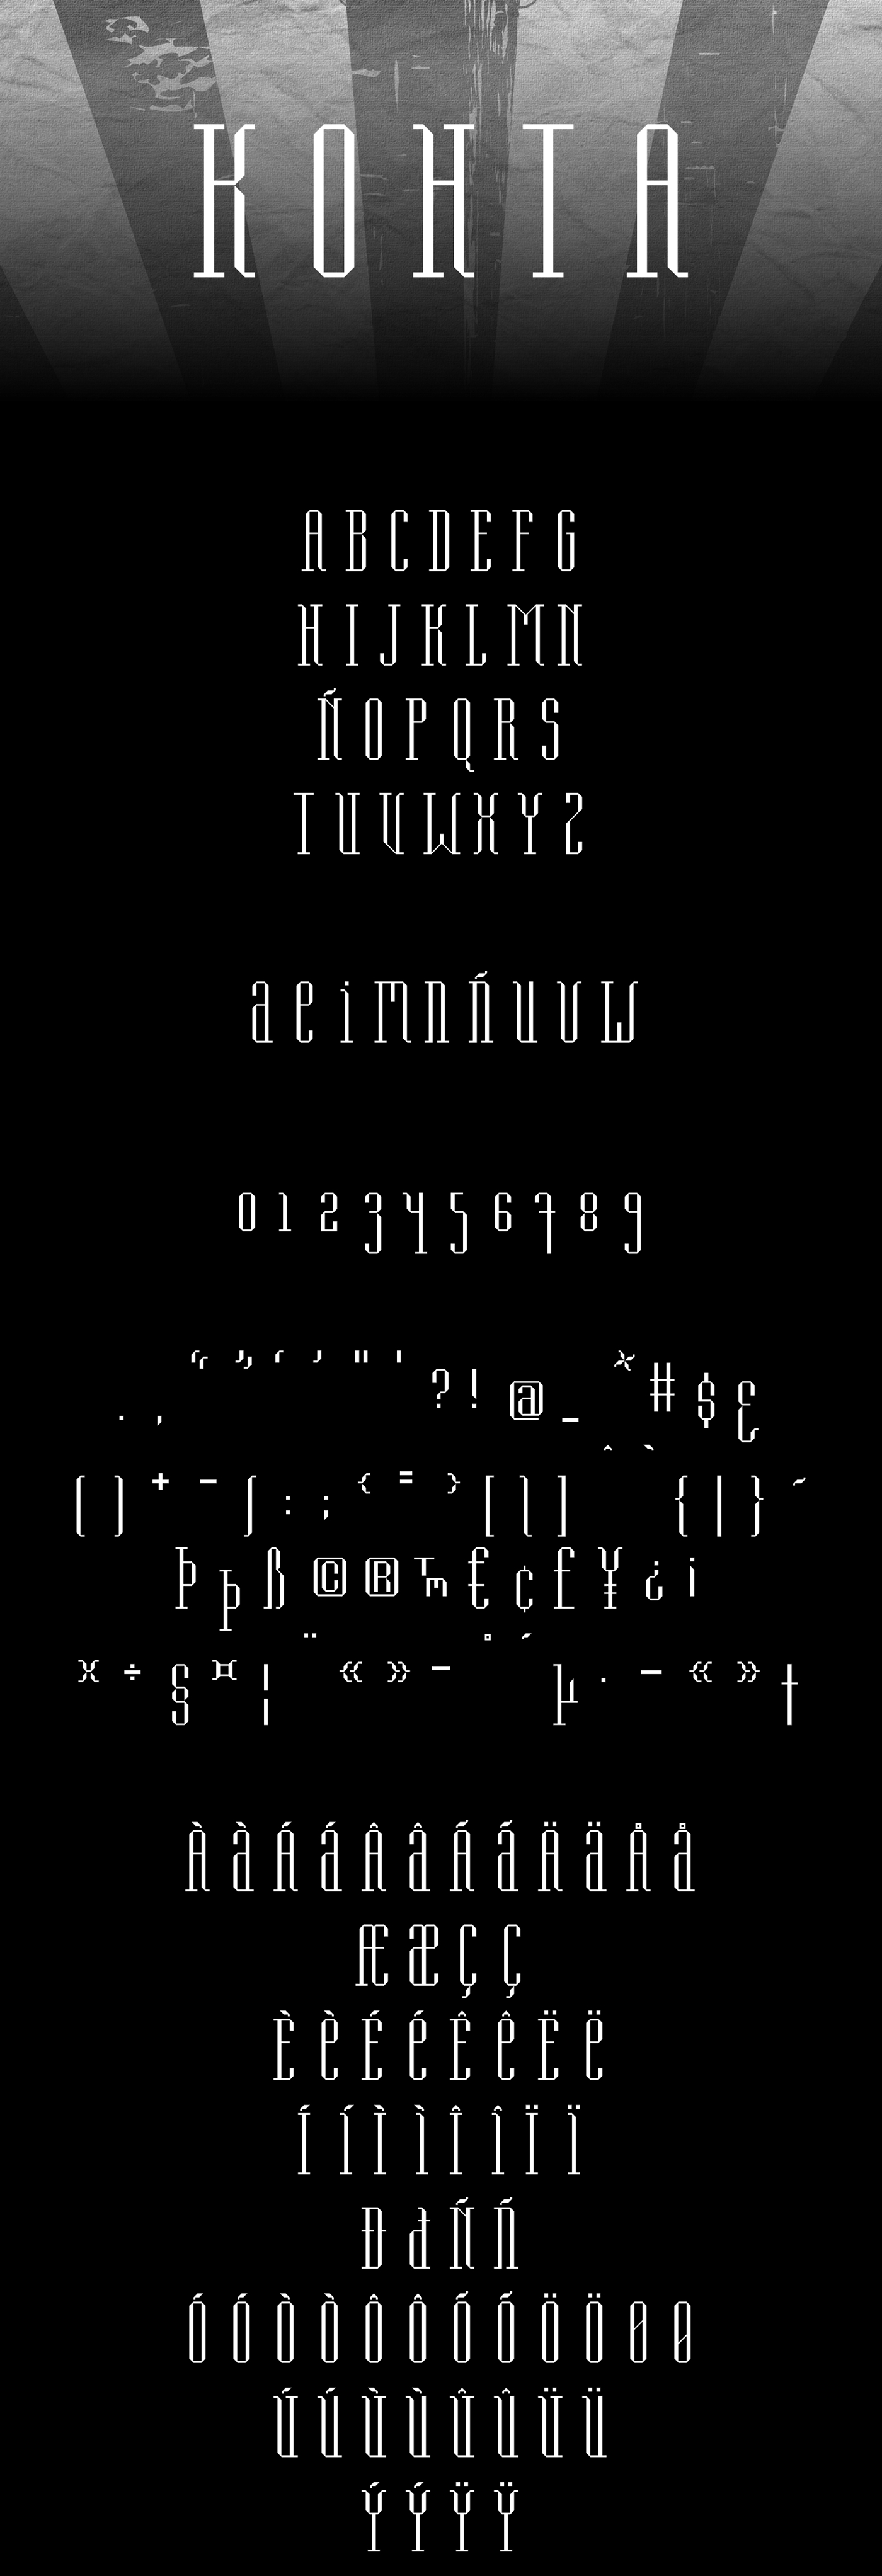 font Free font freefont type freetype free type Typeface freetypeface free typeface freebie Edgar Allan Poe